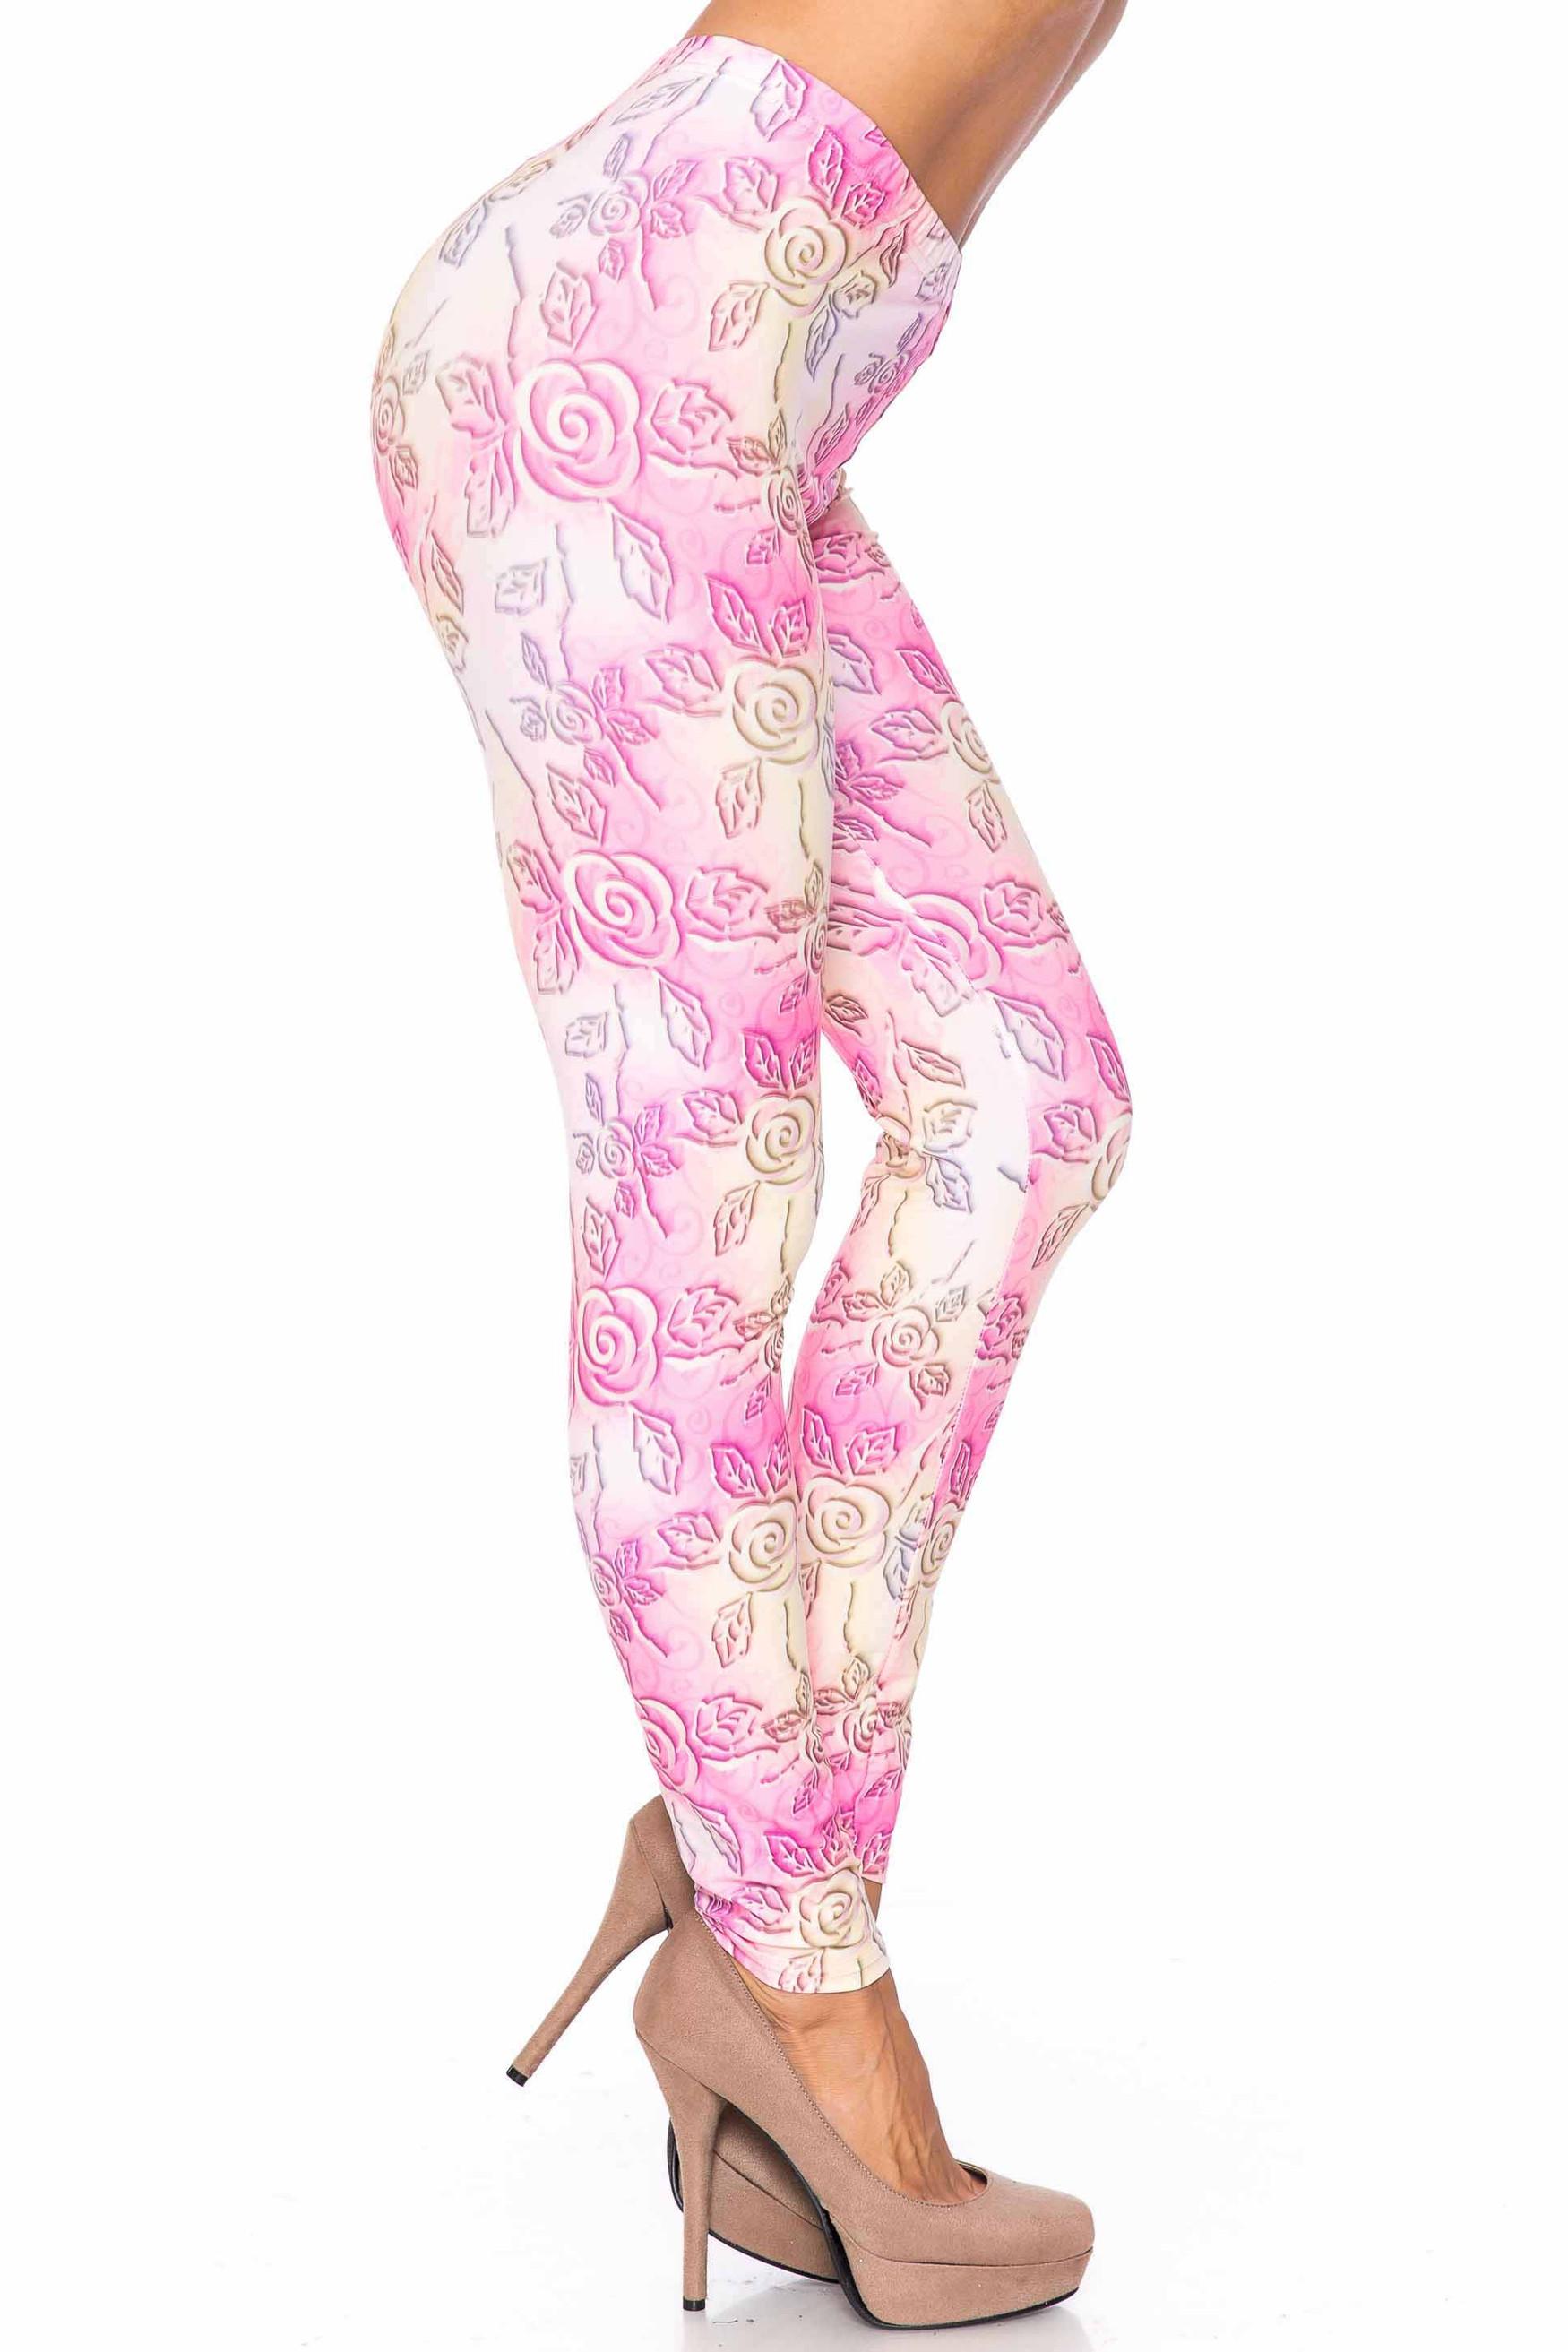 Creamy Soft 3D Pastel Ombre Rose Extra Plus Size Leggings - USA Fashion™